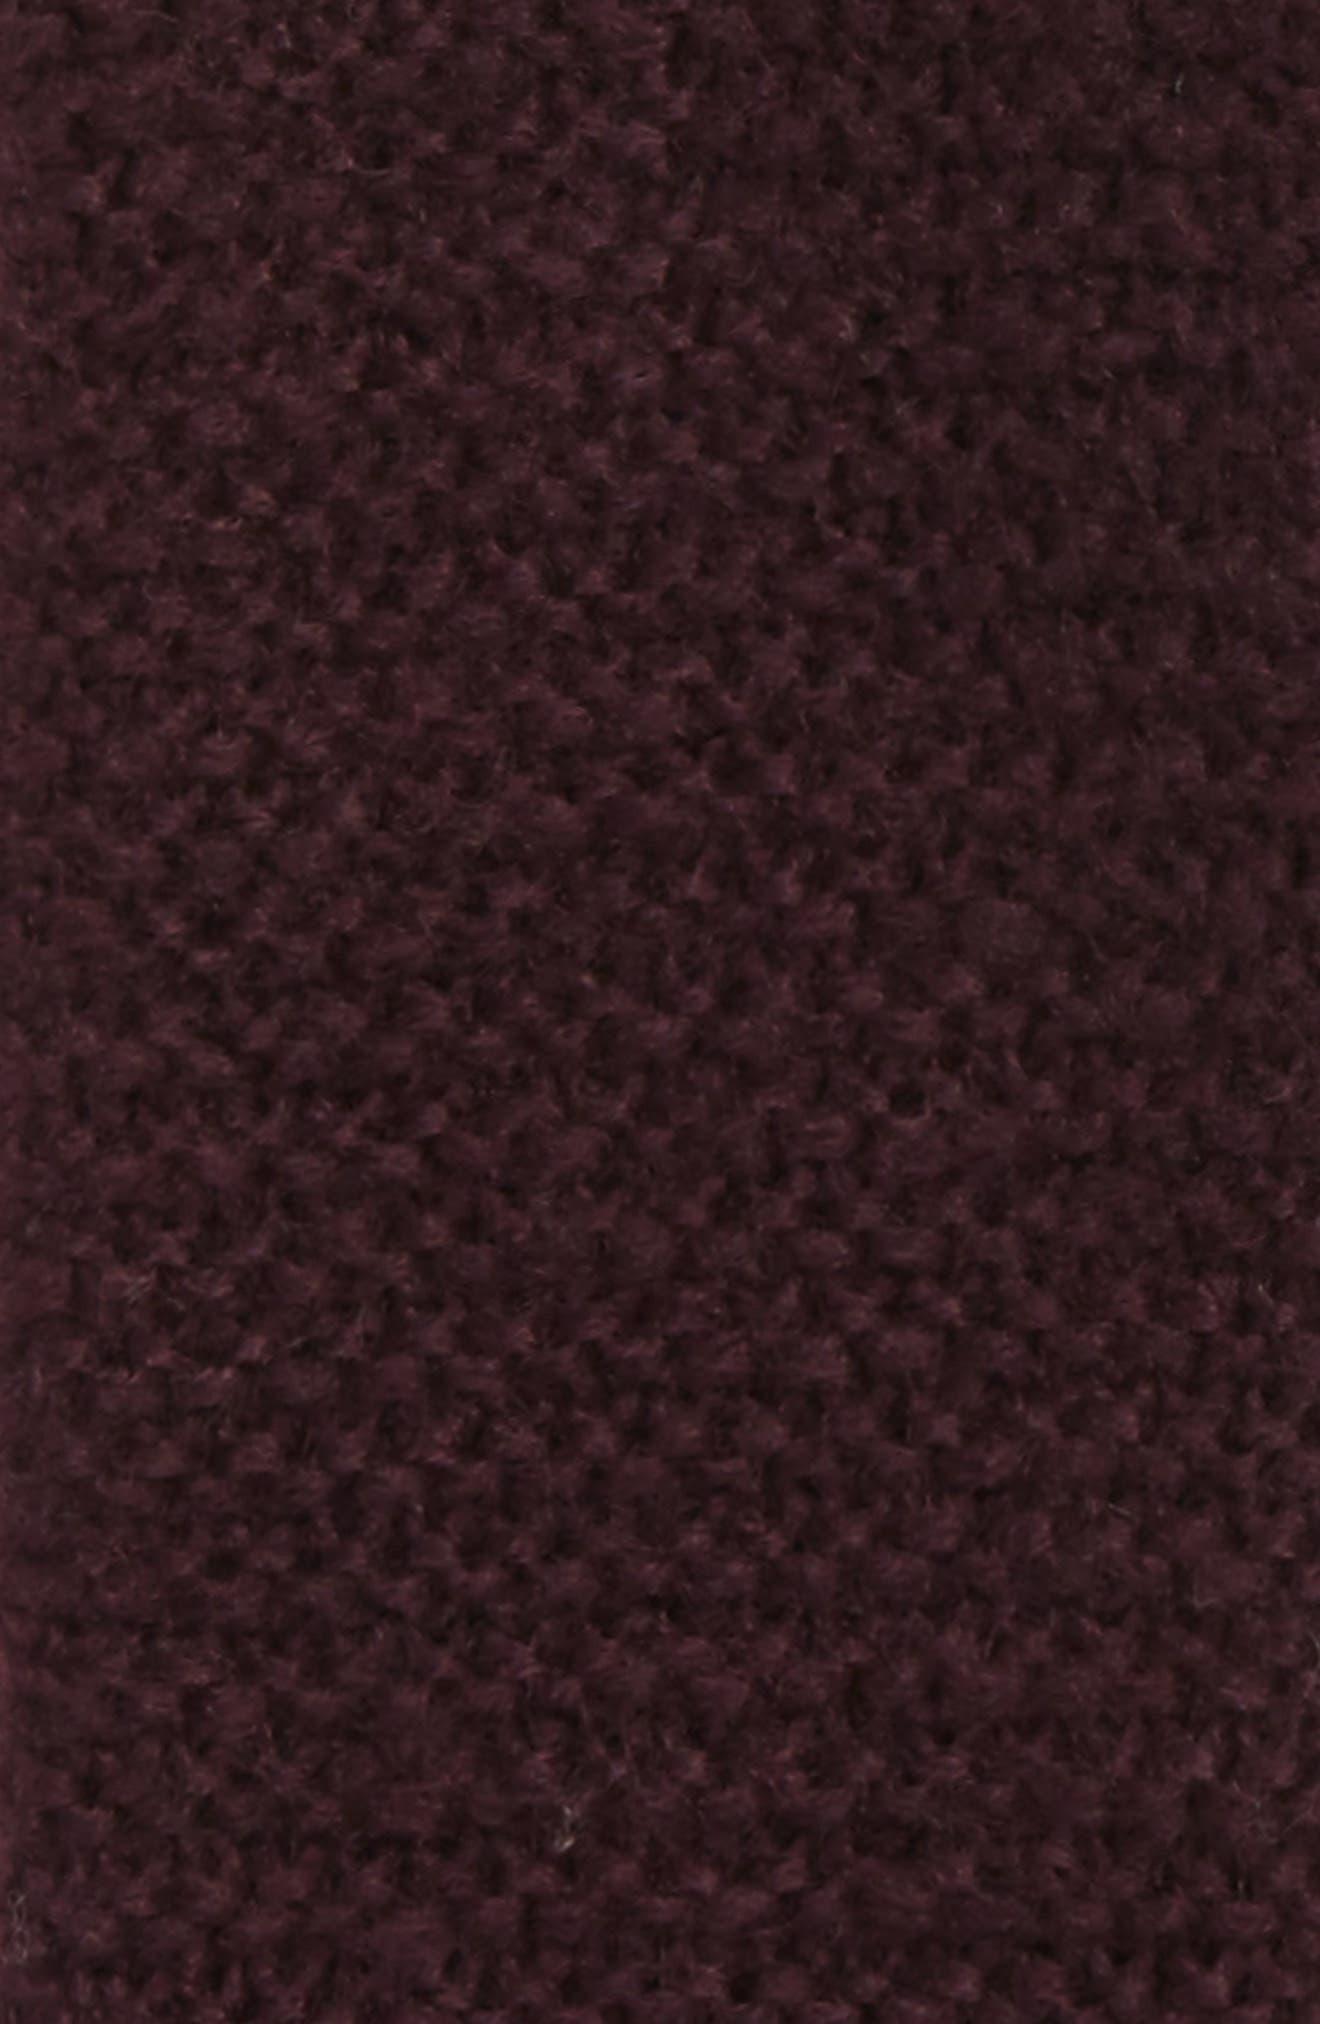 Garter Stitch Fingerless Gloves,                             Alternate thumbnail 2, color,                             Deep Eggplant